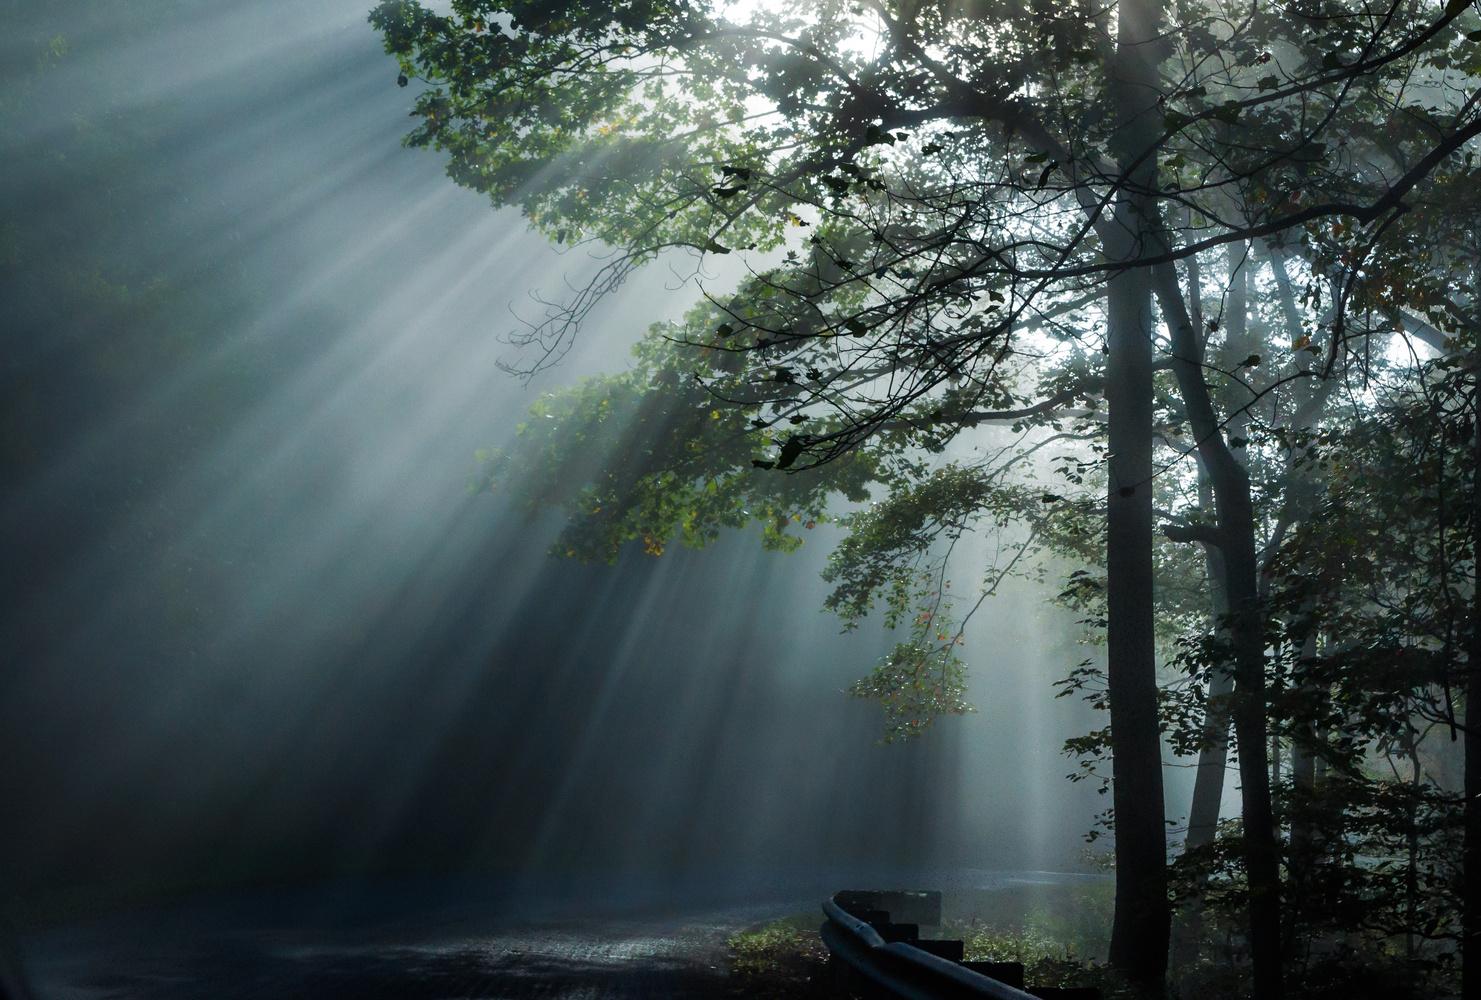 Into the Light by John Crisp